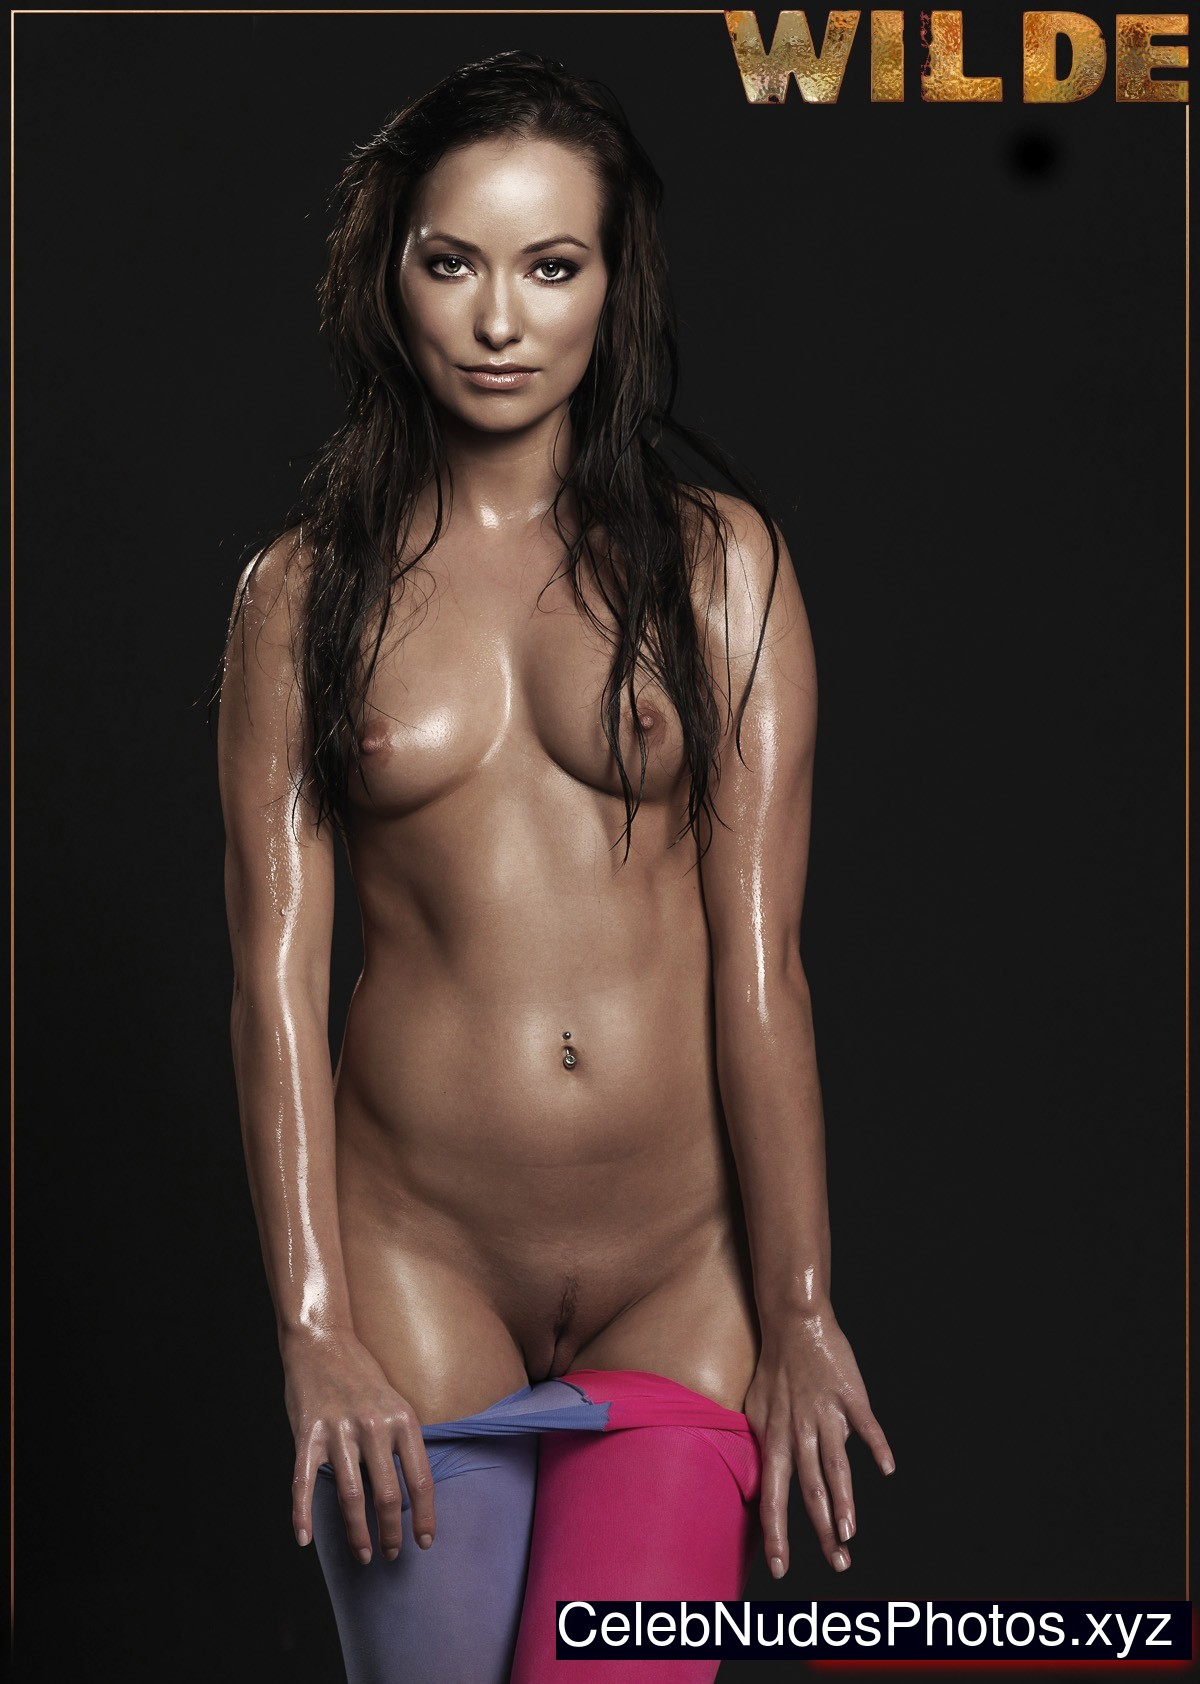 free nude female celebs